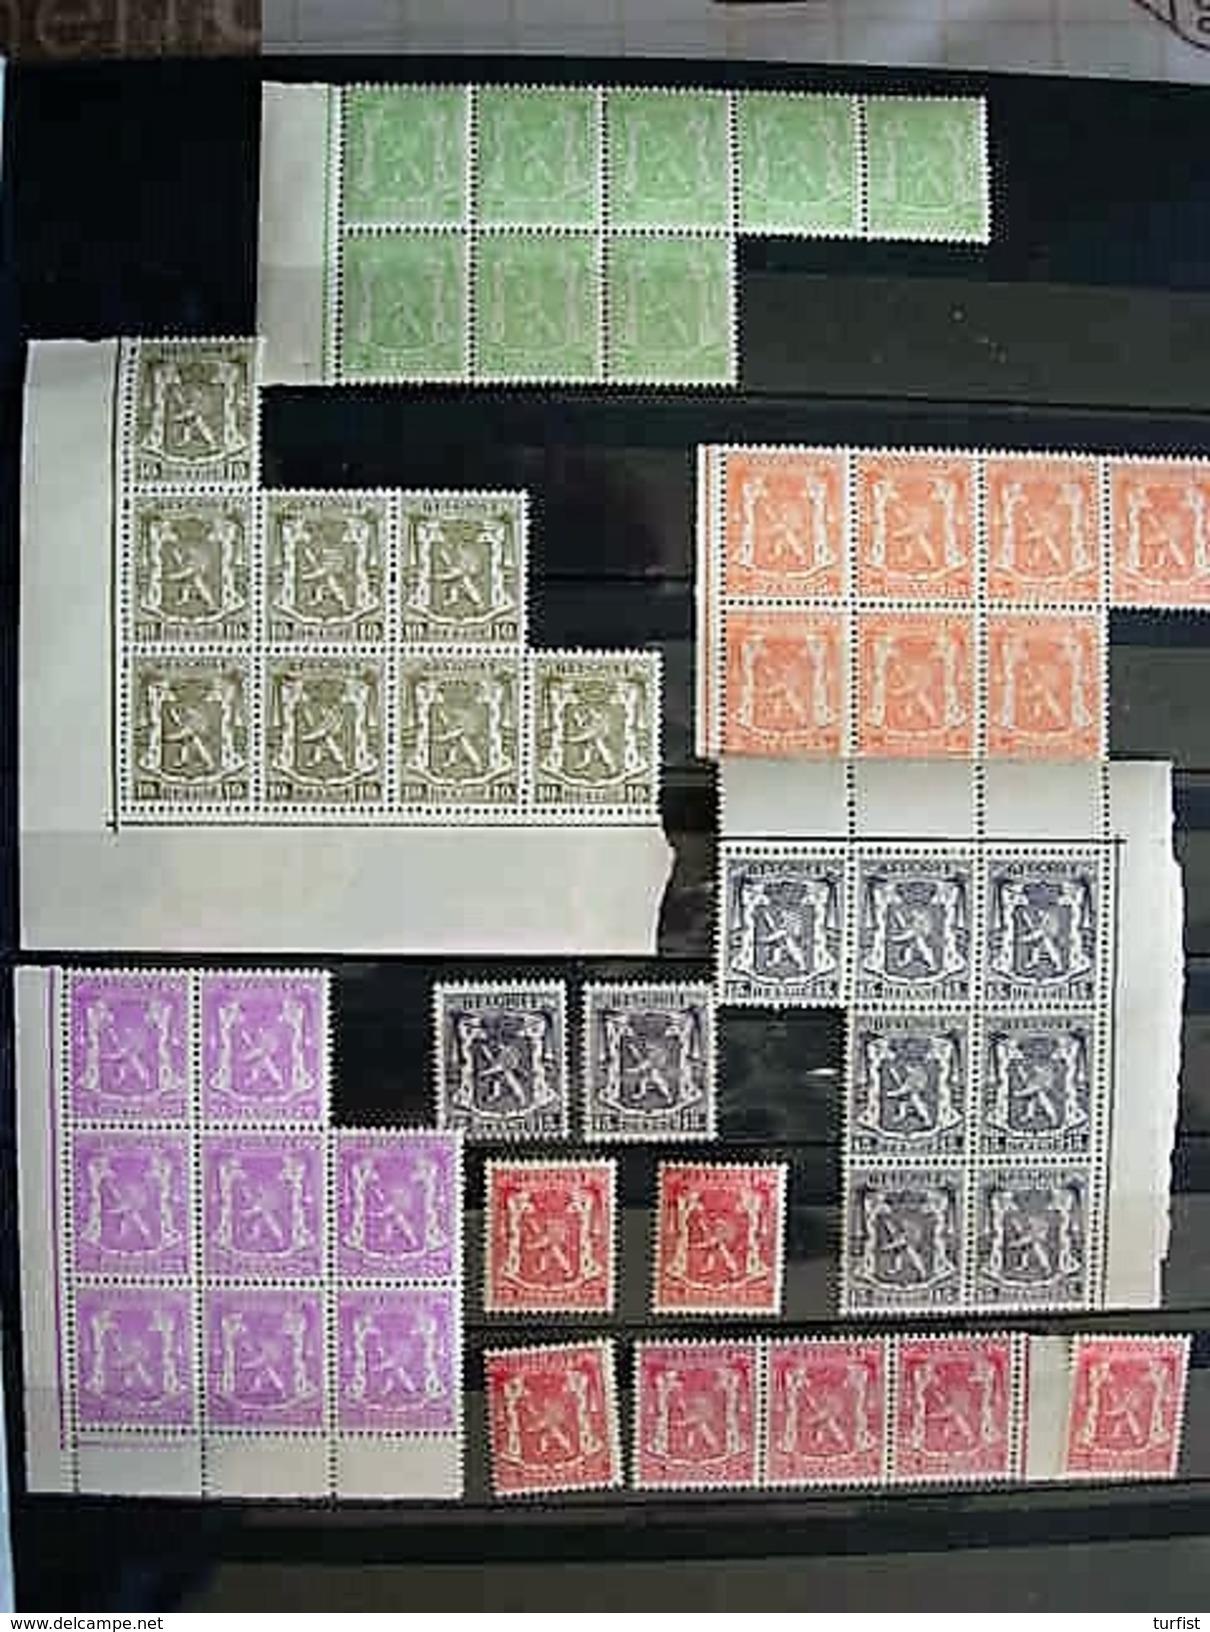 NRS 418A(x8)419(x7)420(x8)421(x9)422(x8)423(x7)424(x11)425(x9)426(x8) POSTFRIS - 1935-1949 Kleines Staatssiegel